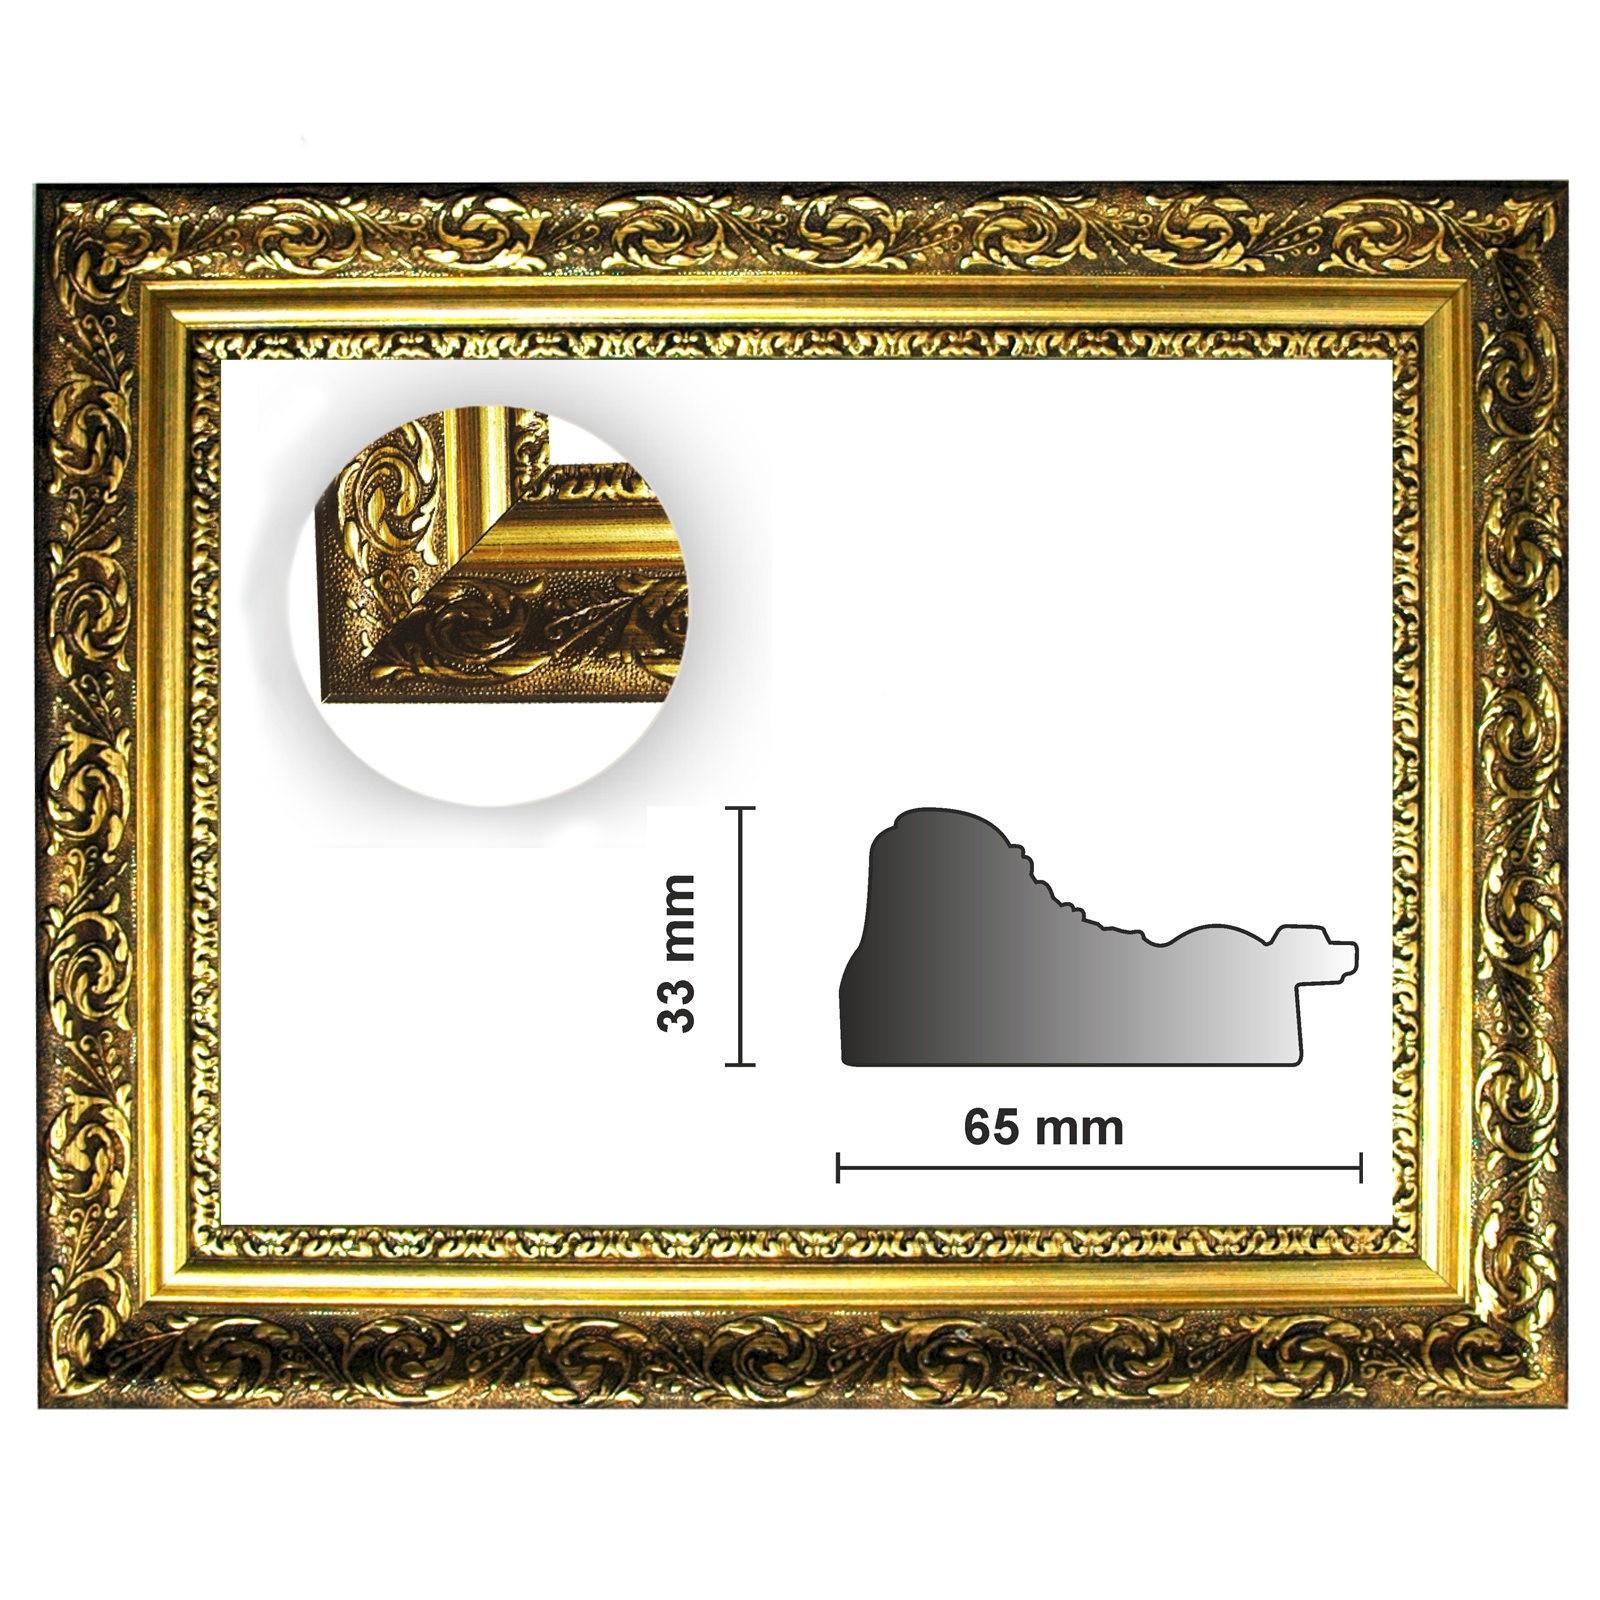 Barockrahmen gold fein verziert 840 ORO, verschiedene Varianten